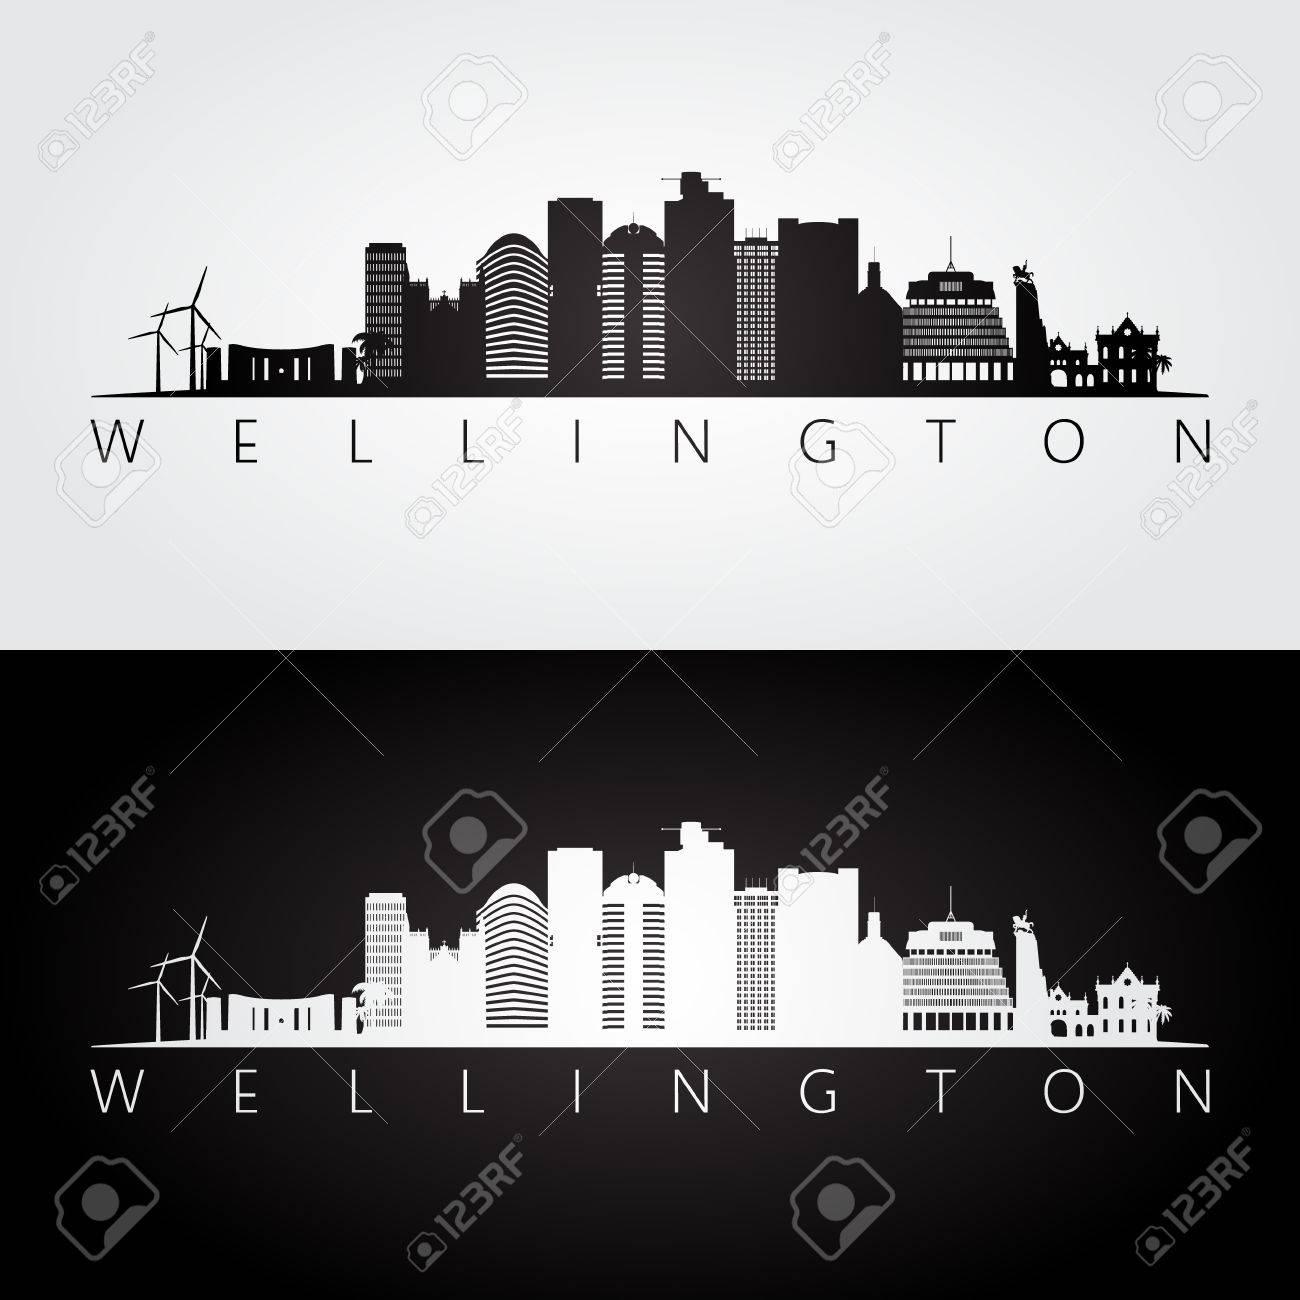 Wellington skyline and landmarks silhouette, black and white design, vector illustration. - 77474856